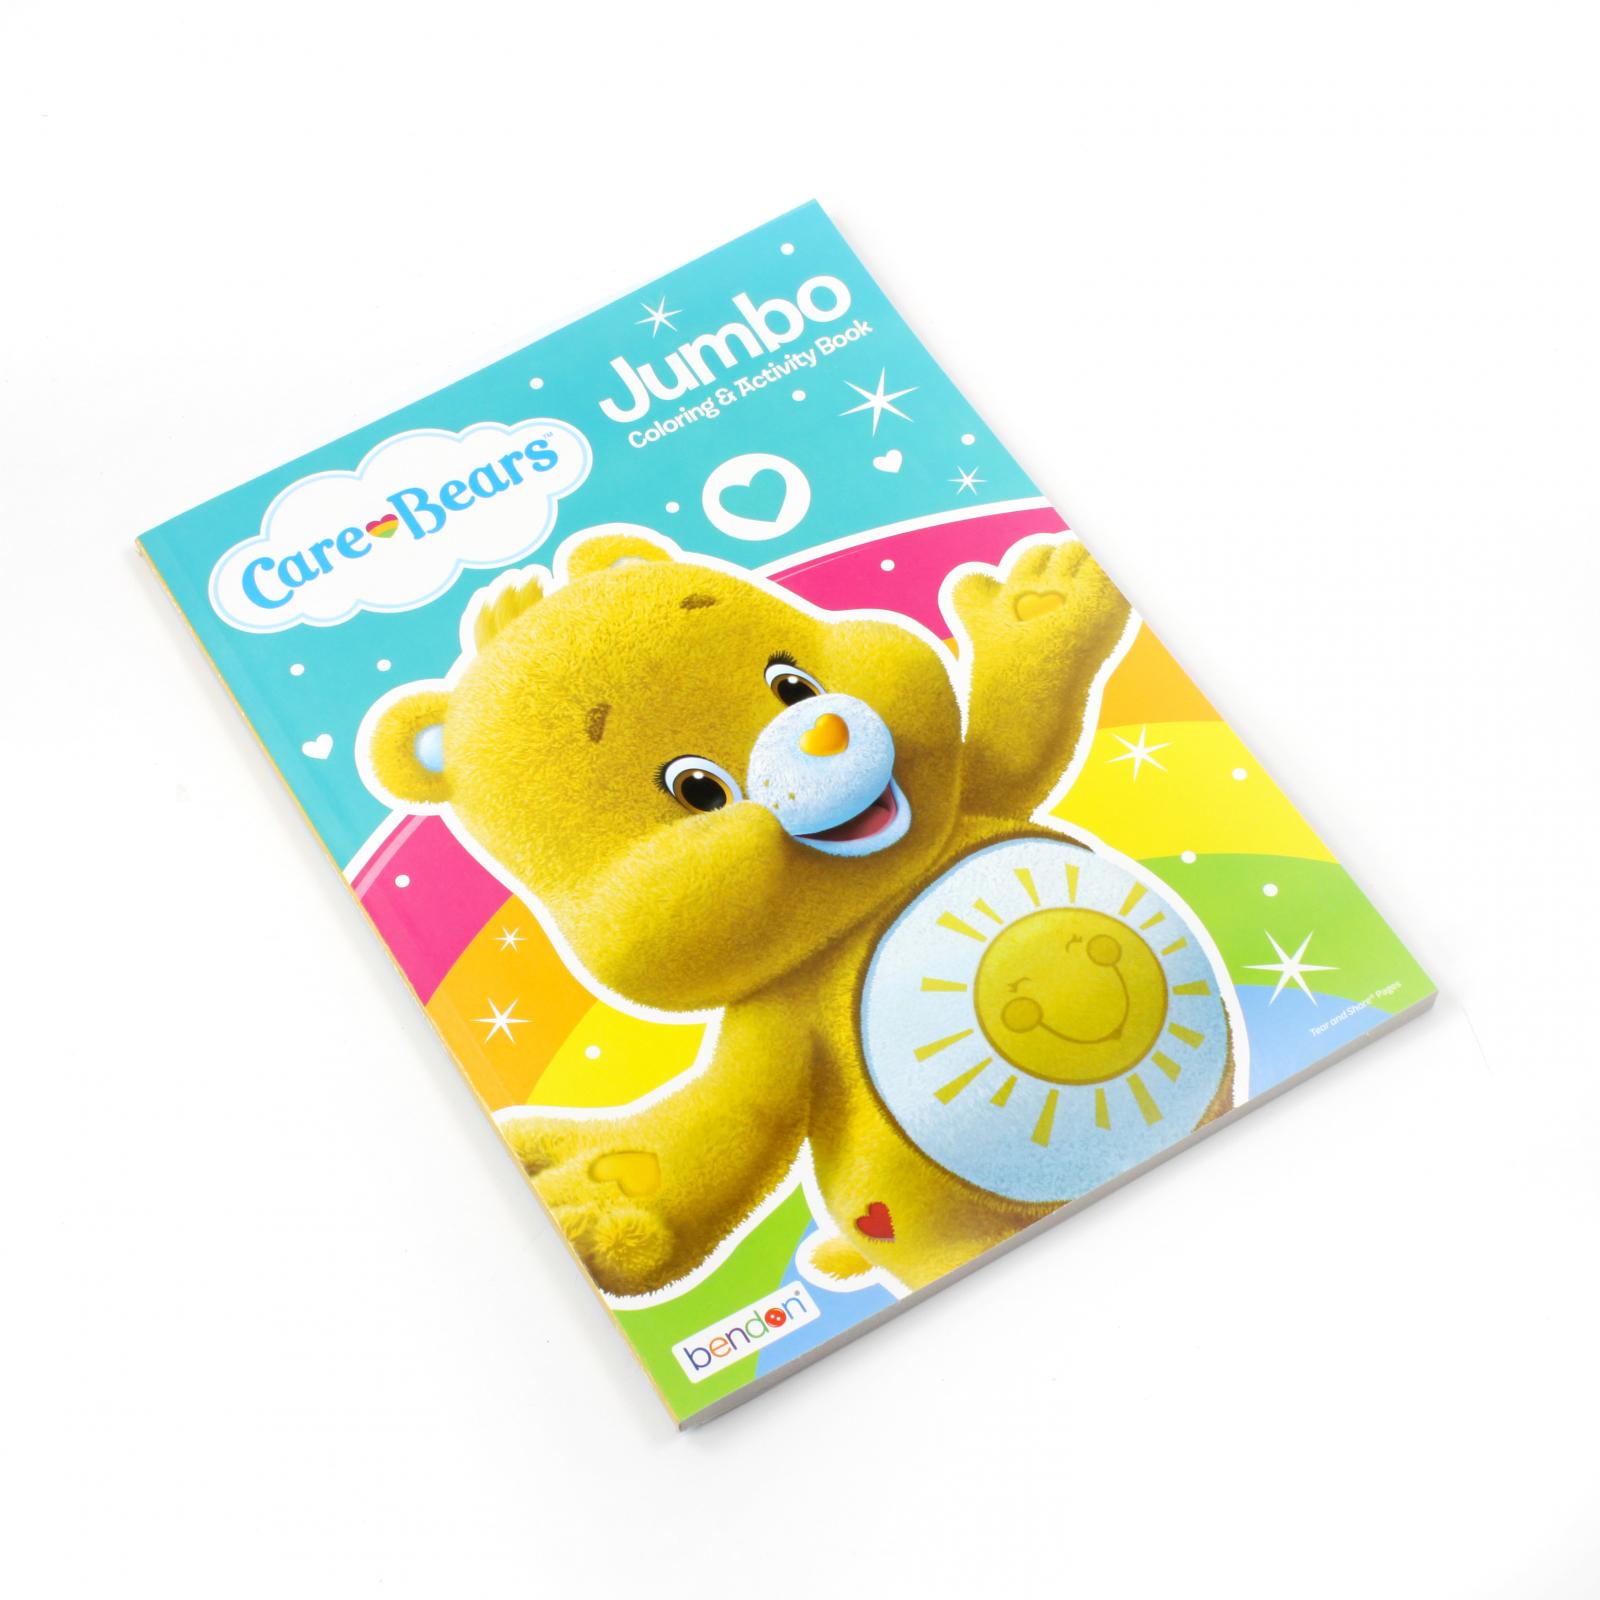 Care Bears Kids Jumbo Coloring Book Activity Funshine Bear